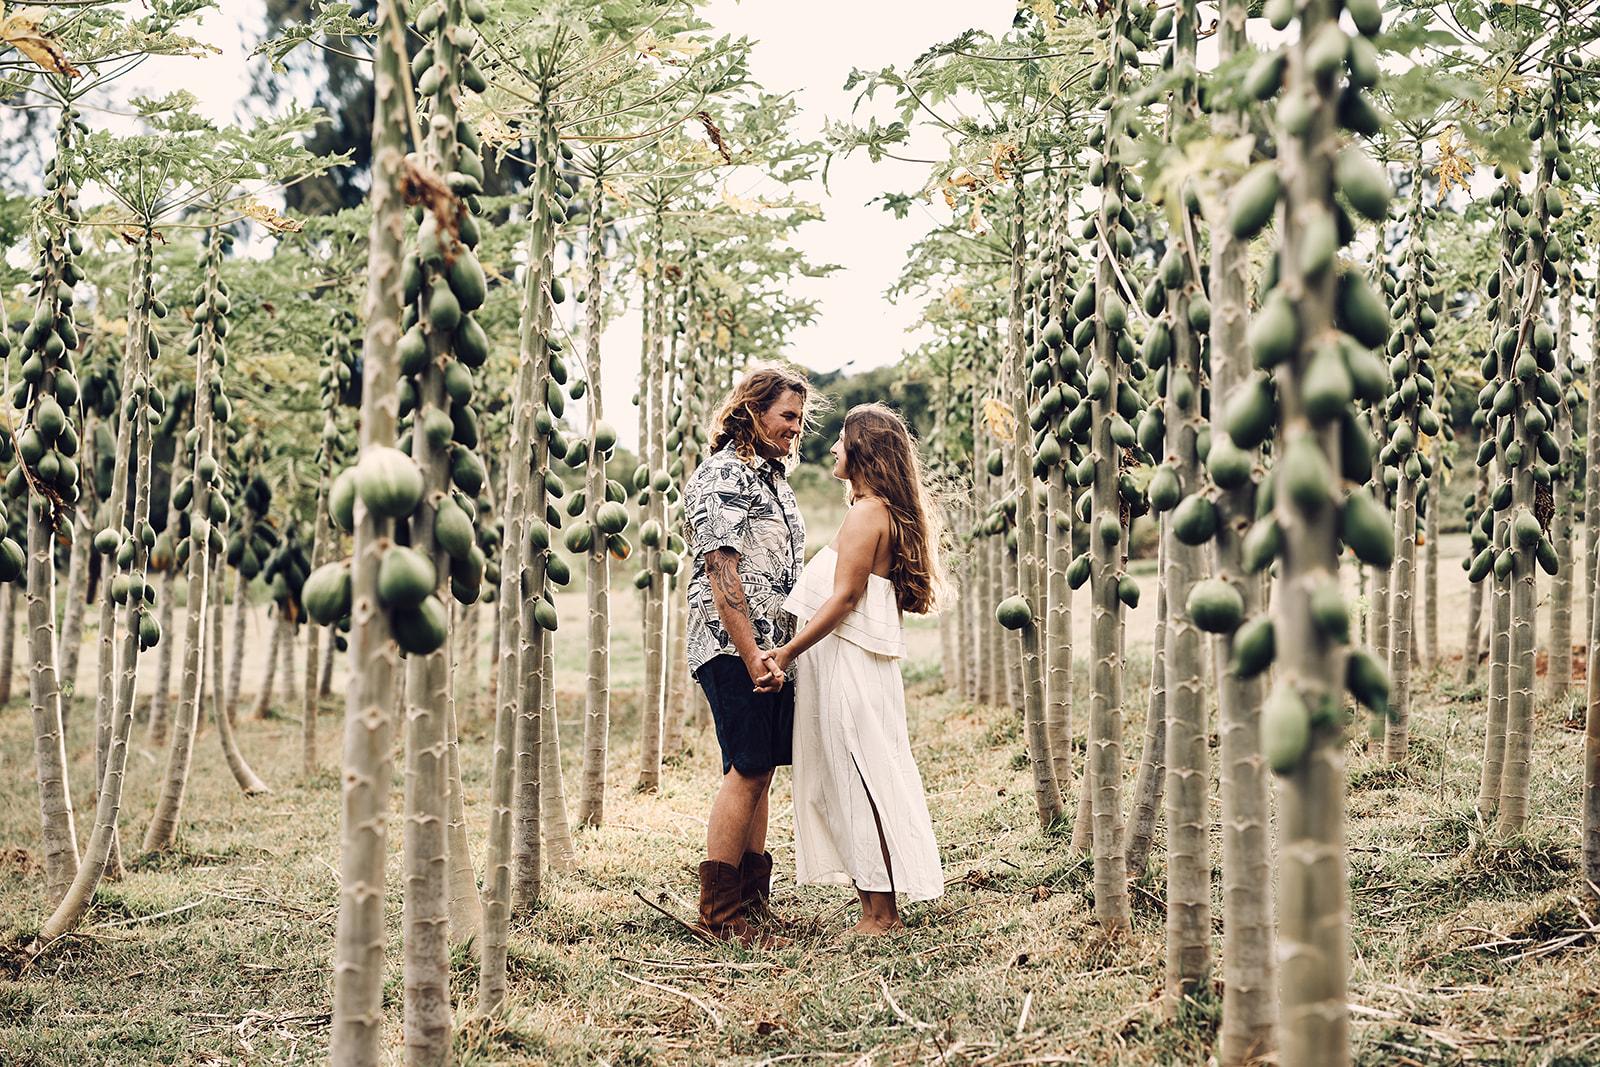 Kauai Farm Location For Photoshoot Timbers Resort